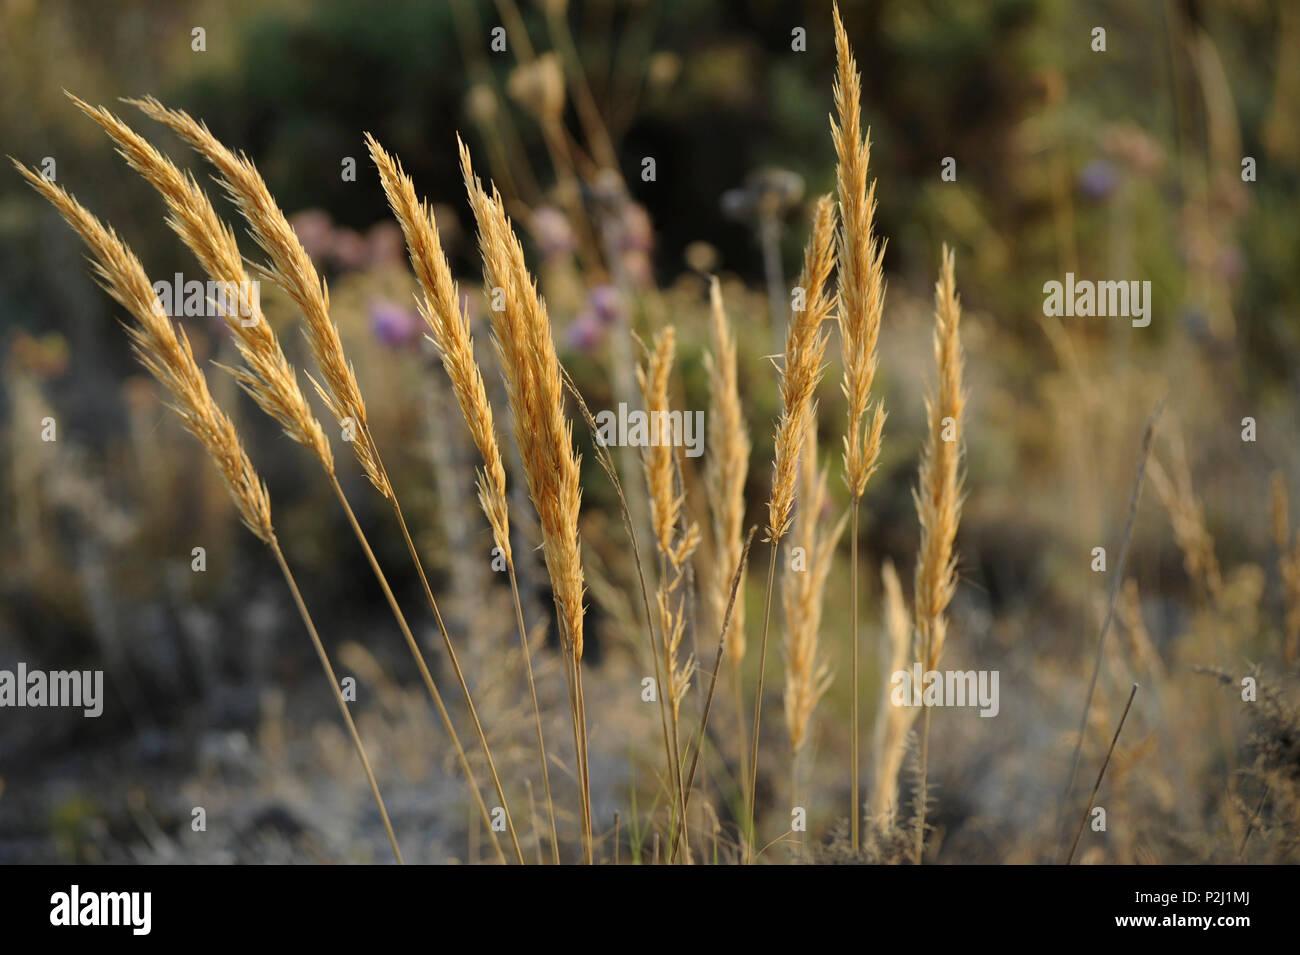 Dried grass in the Serrania de Ronda, Malaga Province, Andalusia, Spain - Stock Image